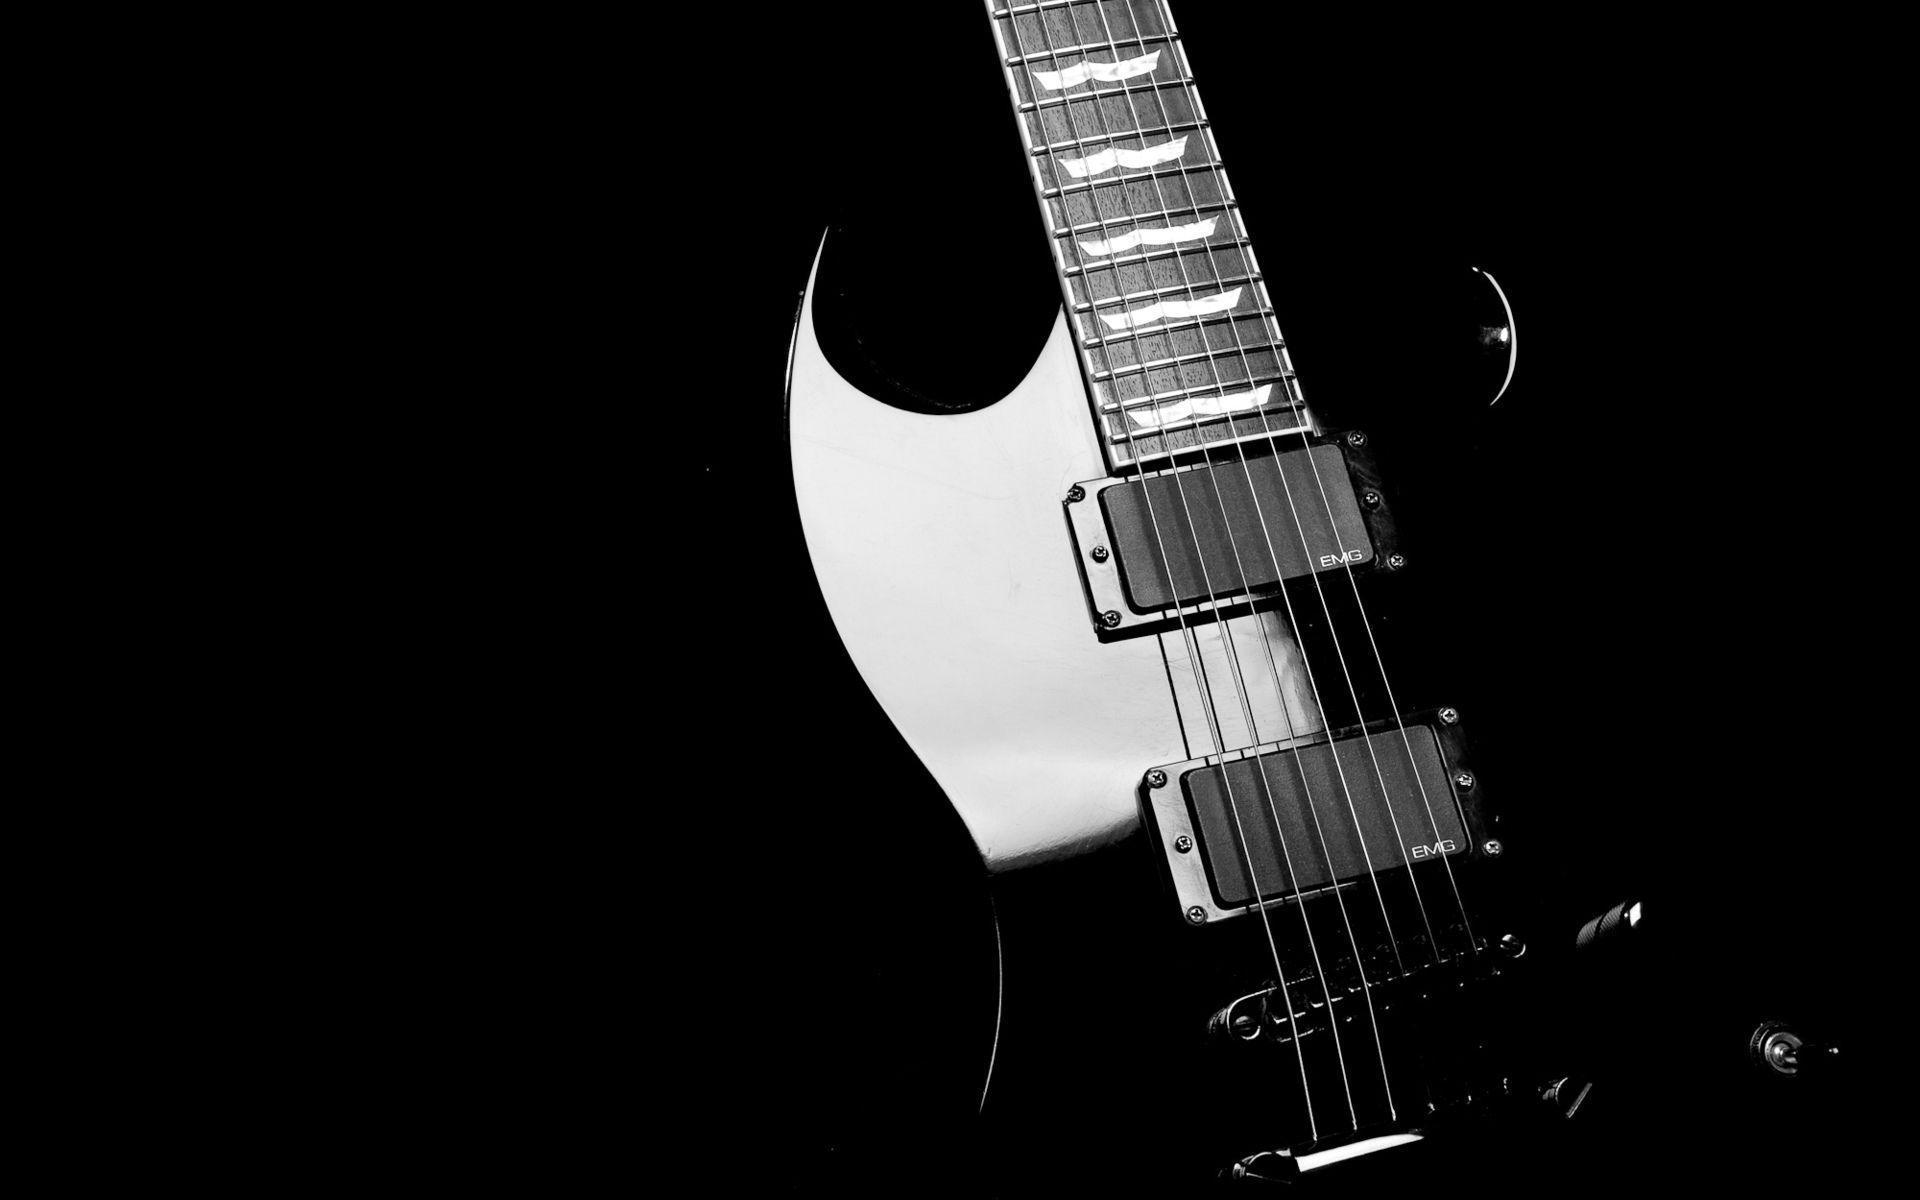 Guitar wallpapers for desktop wallpaper cave - Free guitar wallpapers for pc ...